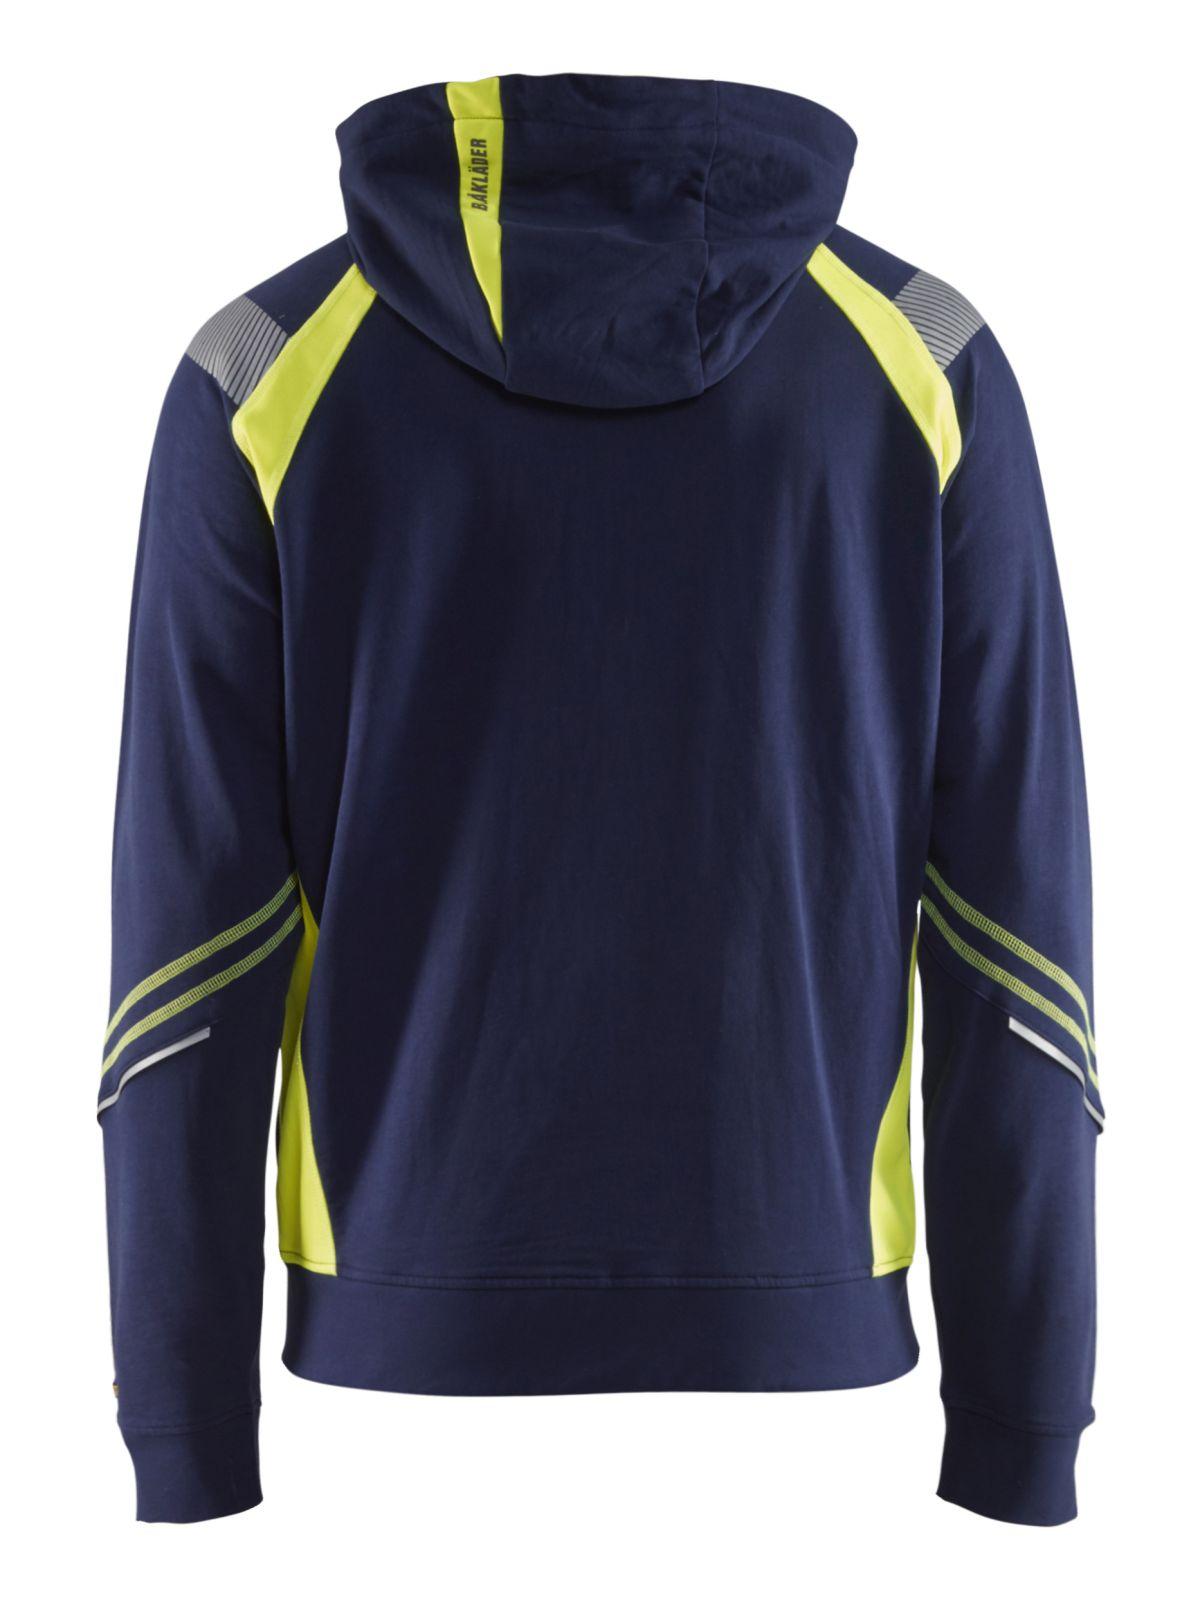 Blaklader Hooded sweatvesten 34331158 marineblauw-geel(8933)